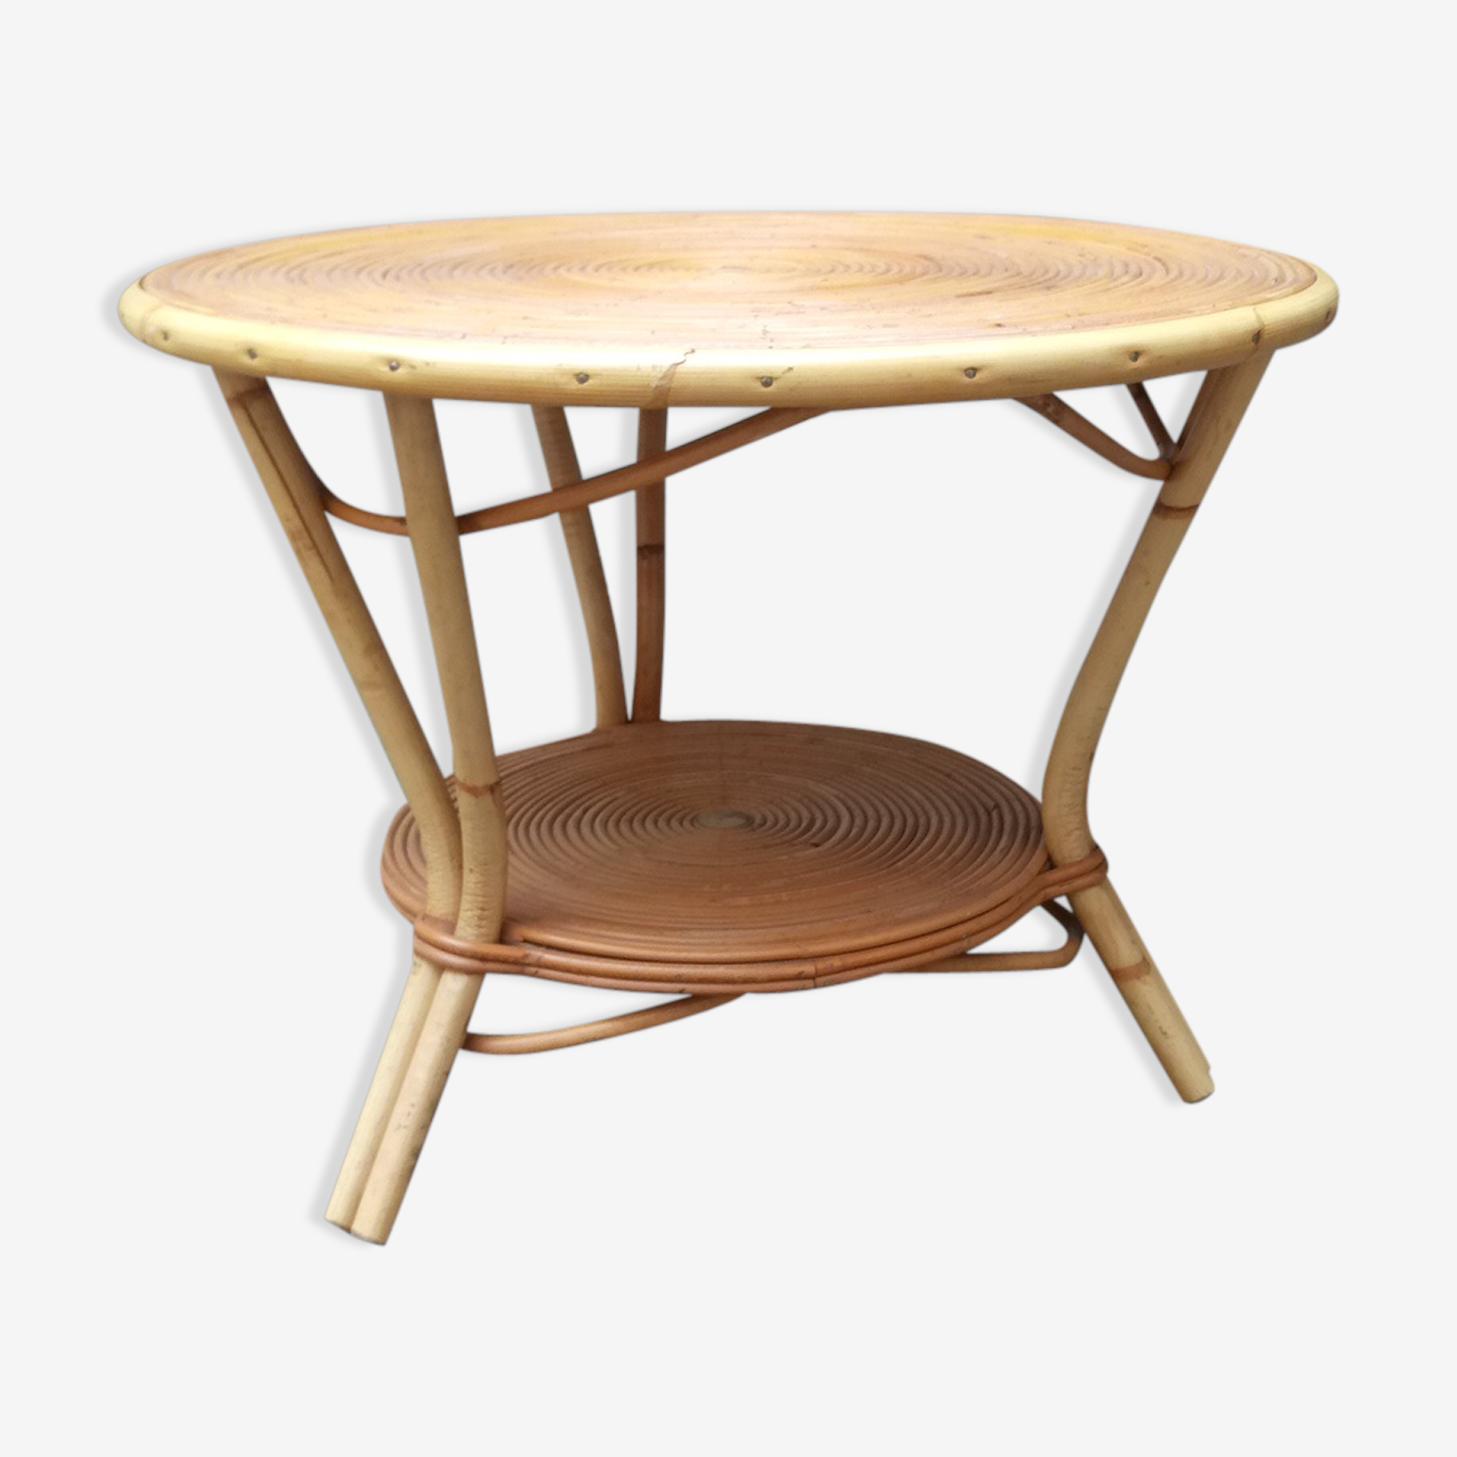 Round vintage rattan low table 1950-1960